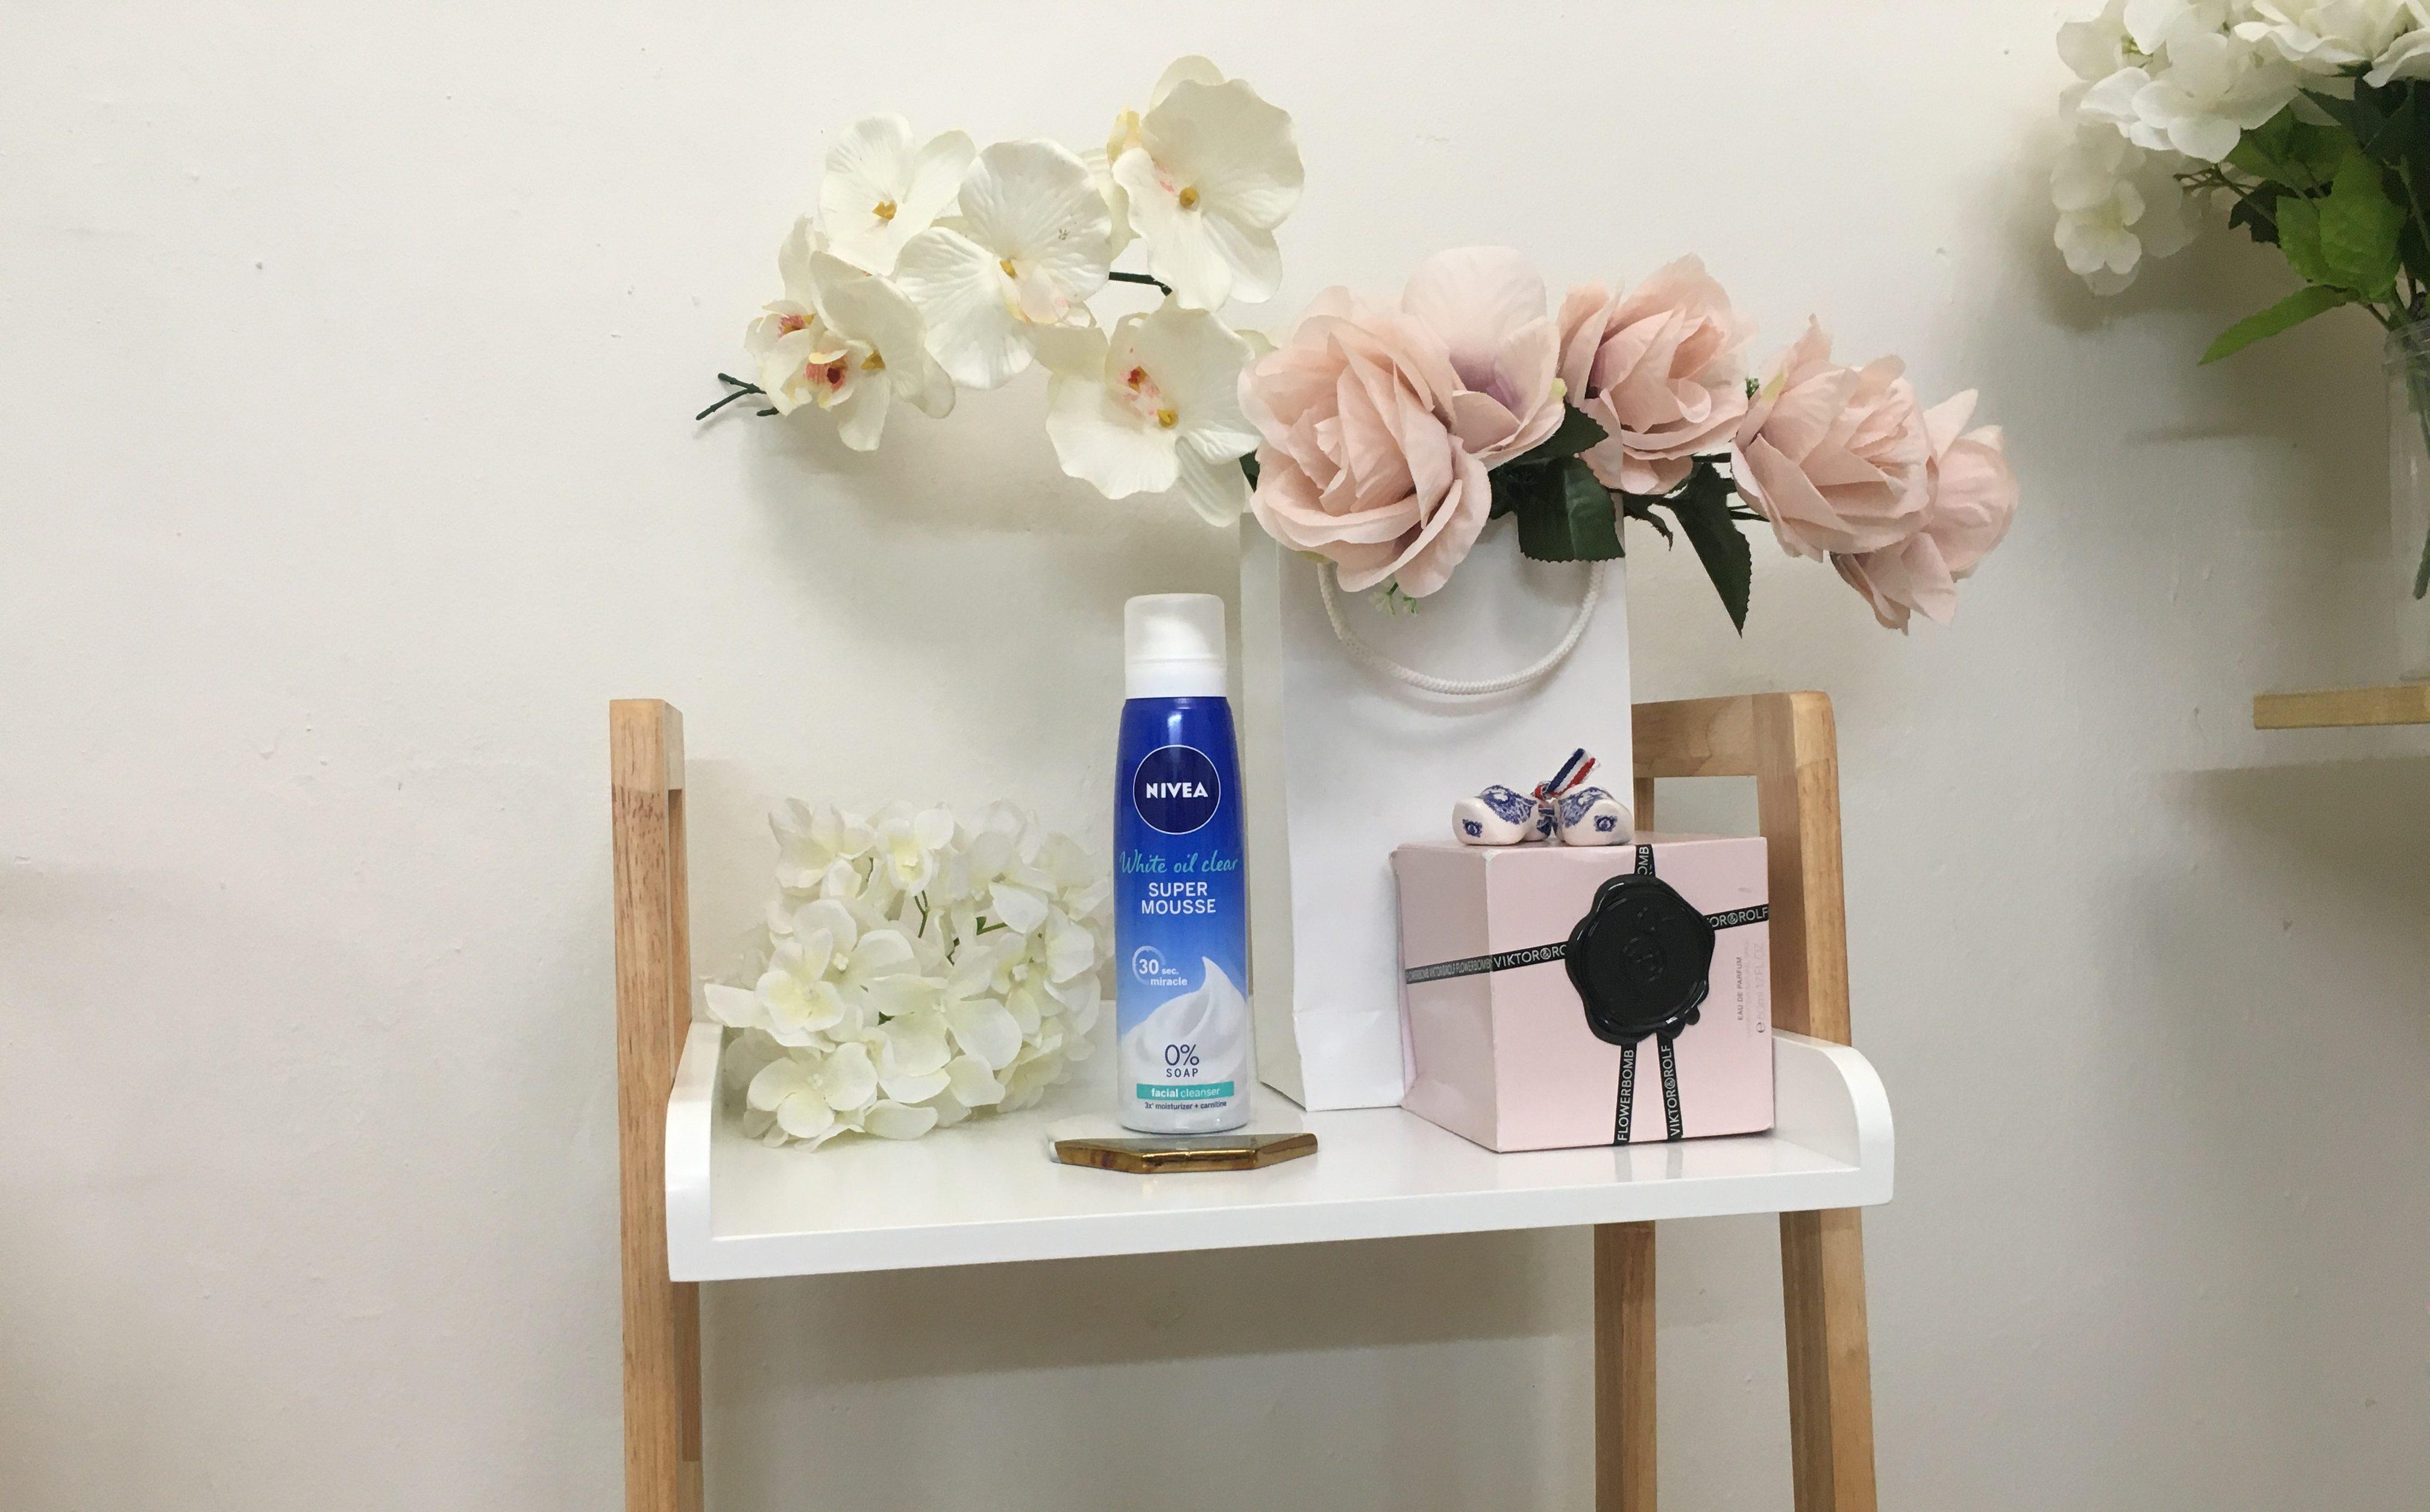 Nivea Pearl White Super Mousse Facial Cleanser Review